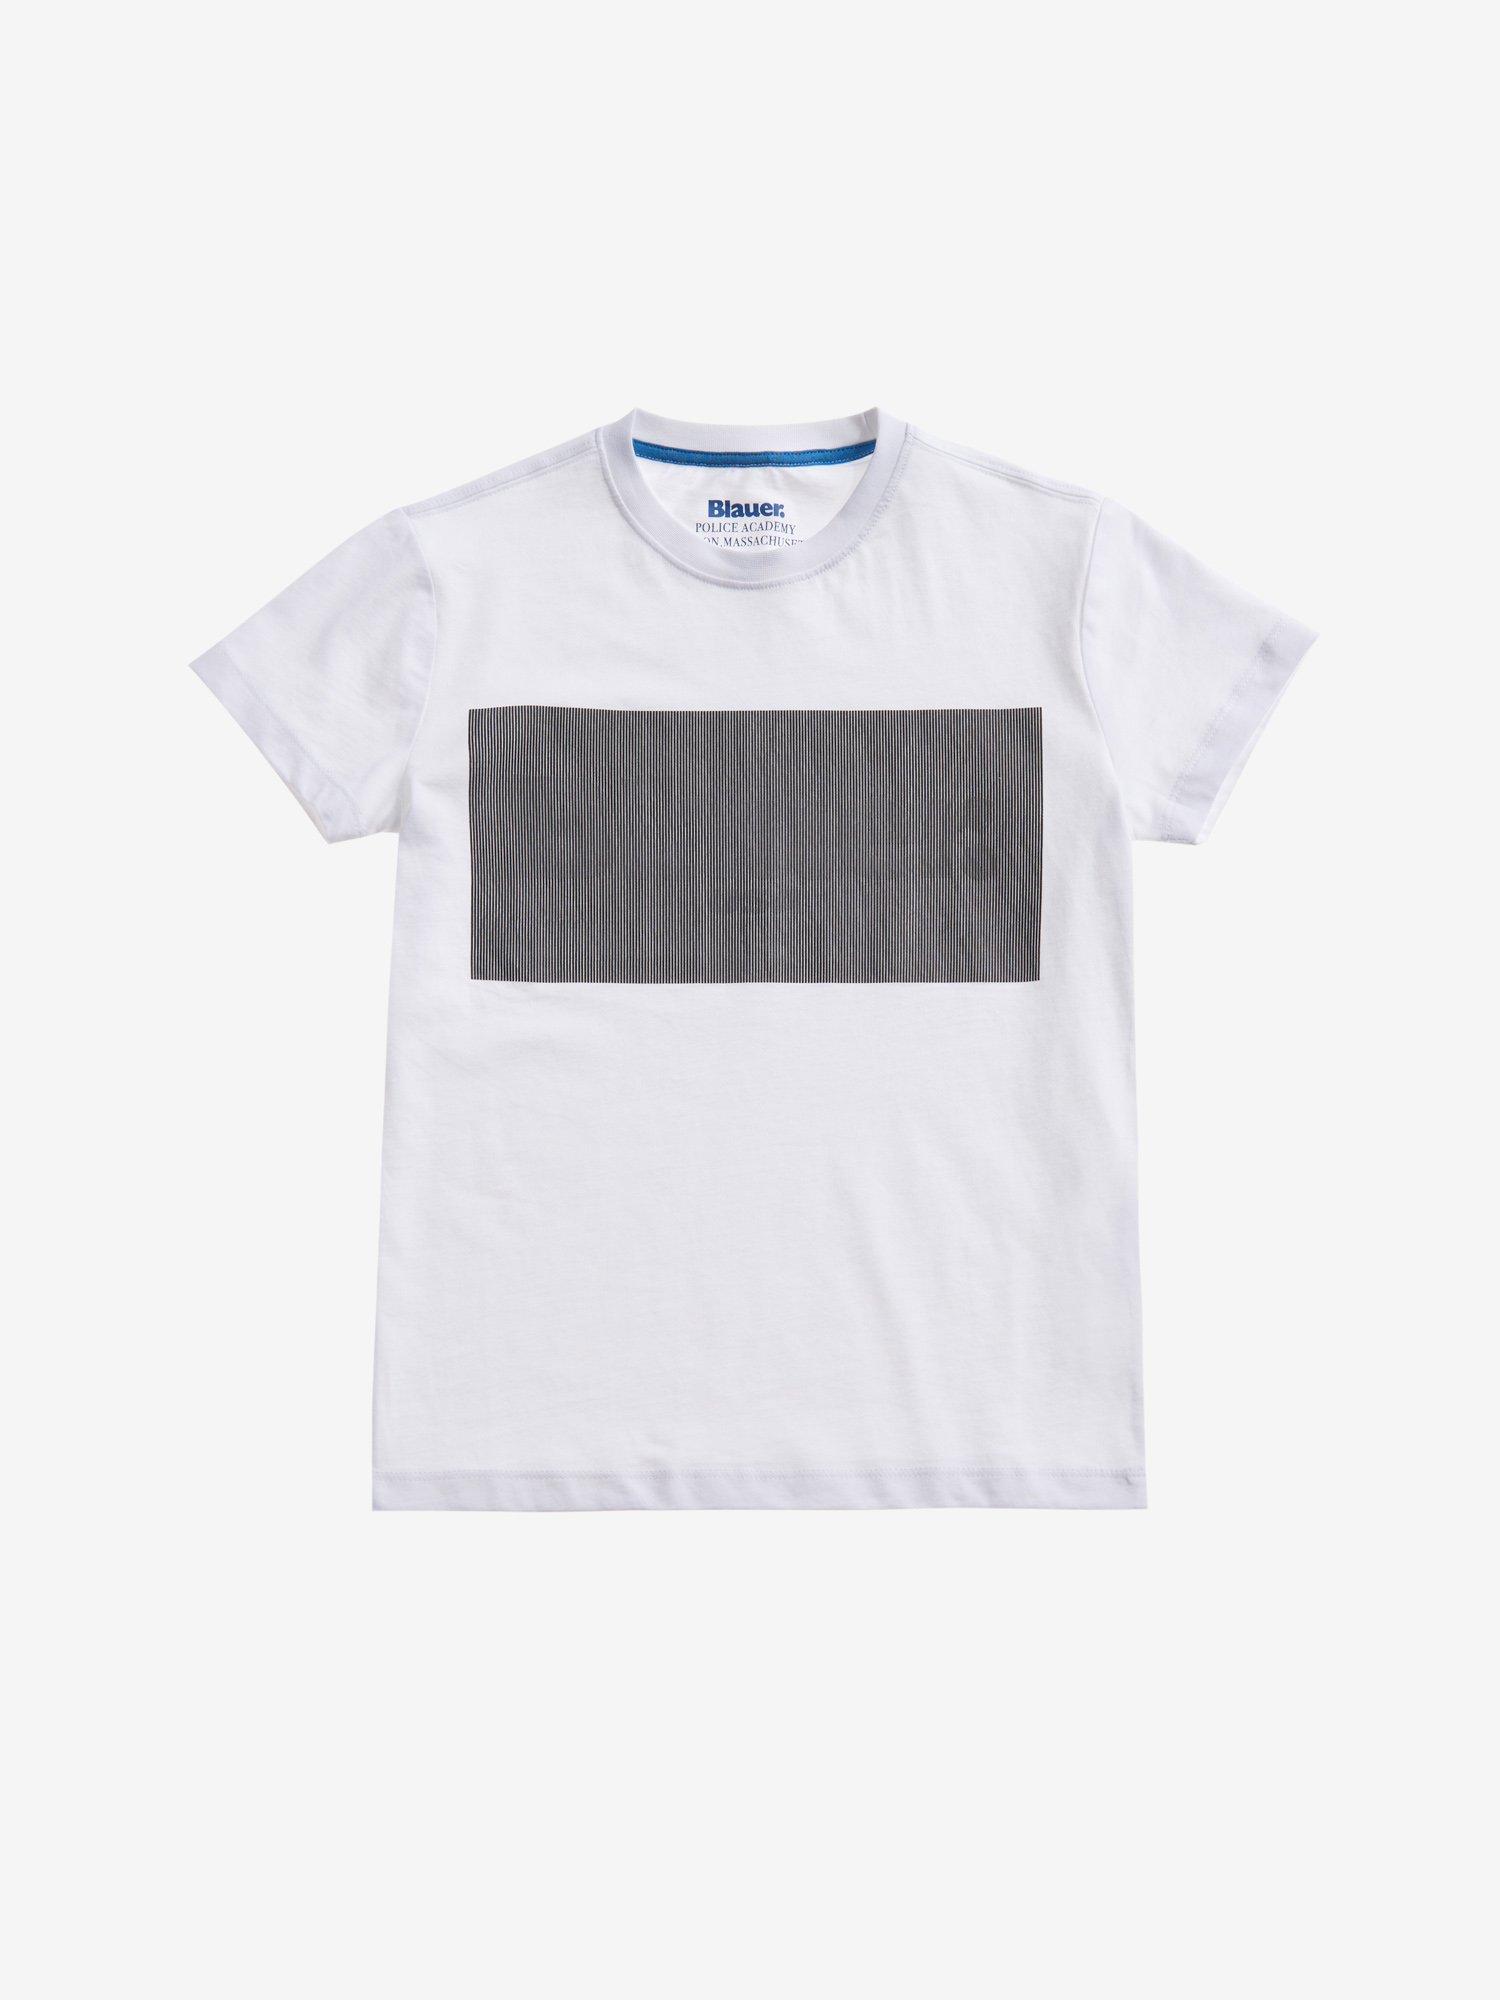 Blauer - T-SHIRT WITH LENTICULAR PRINT - white - Blauer